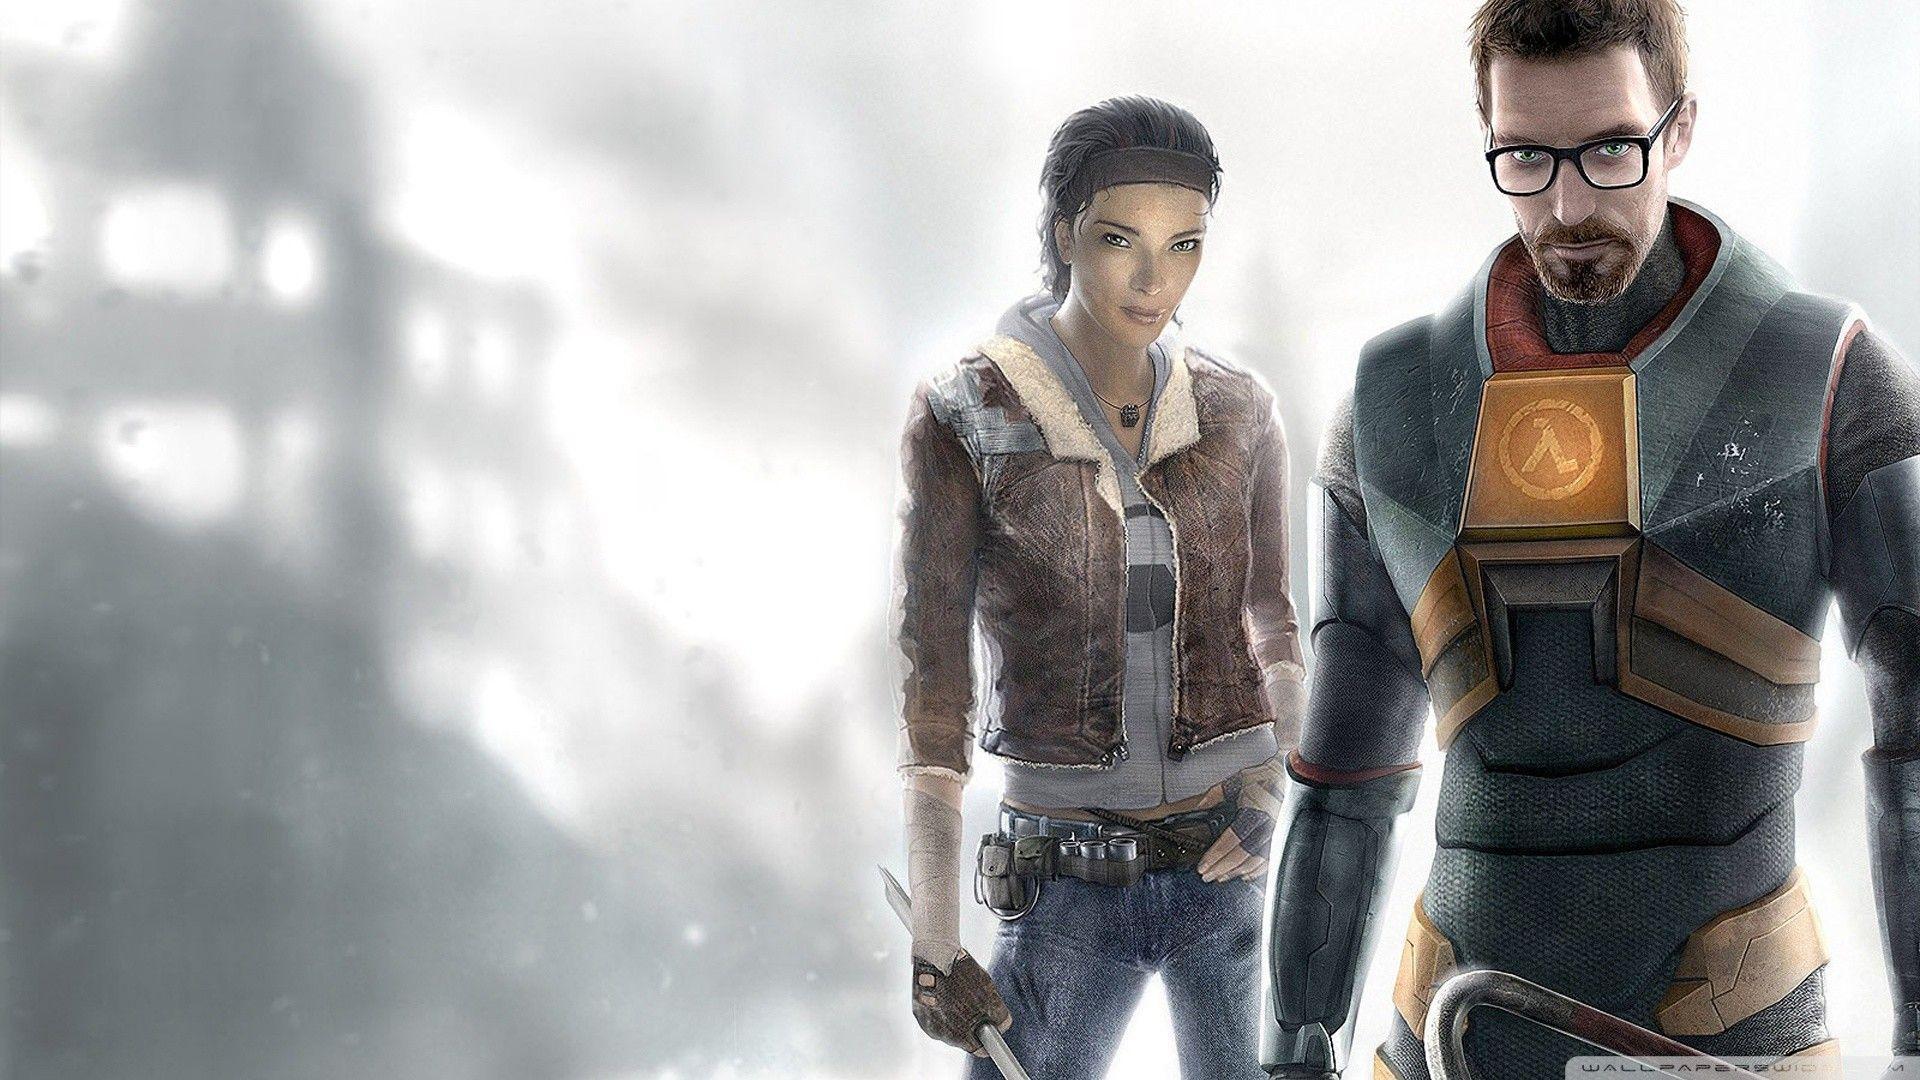 Half Life 2 Wallpapers Top Free Half Life 2 Backgrounds